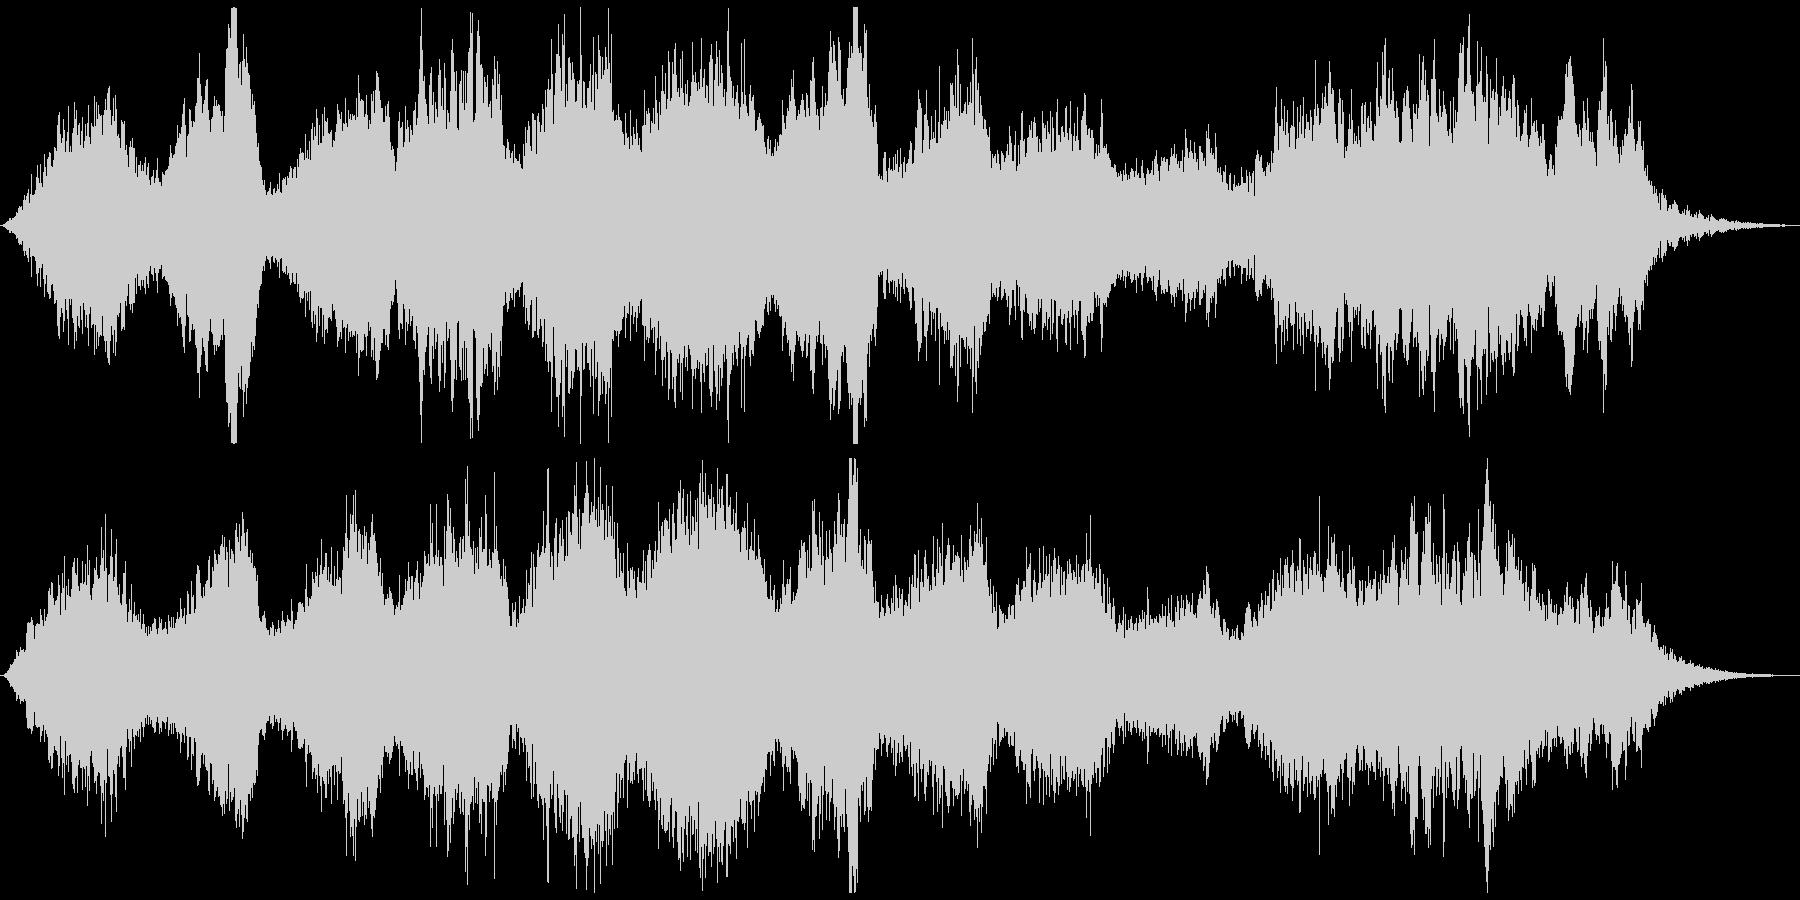 PADS 寒い日01の未再生の波形